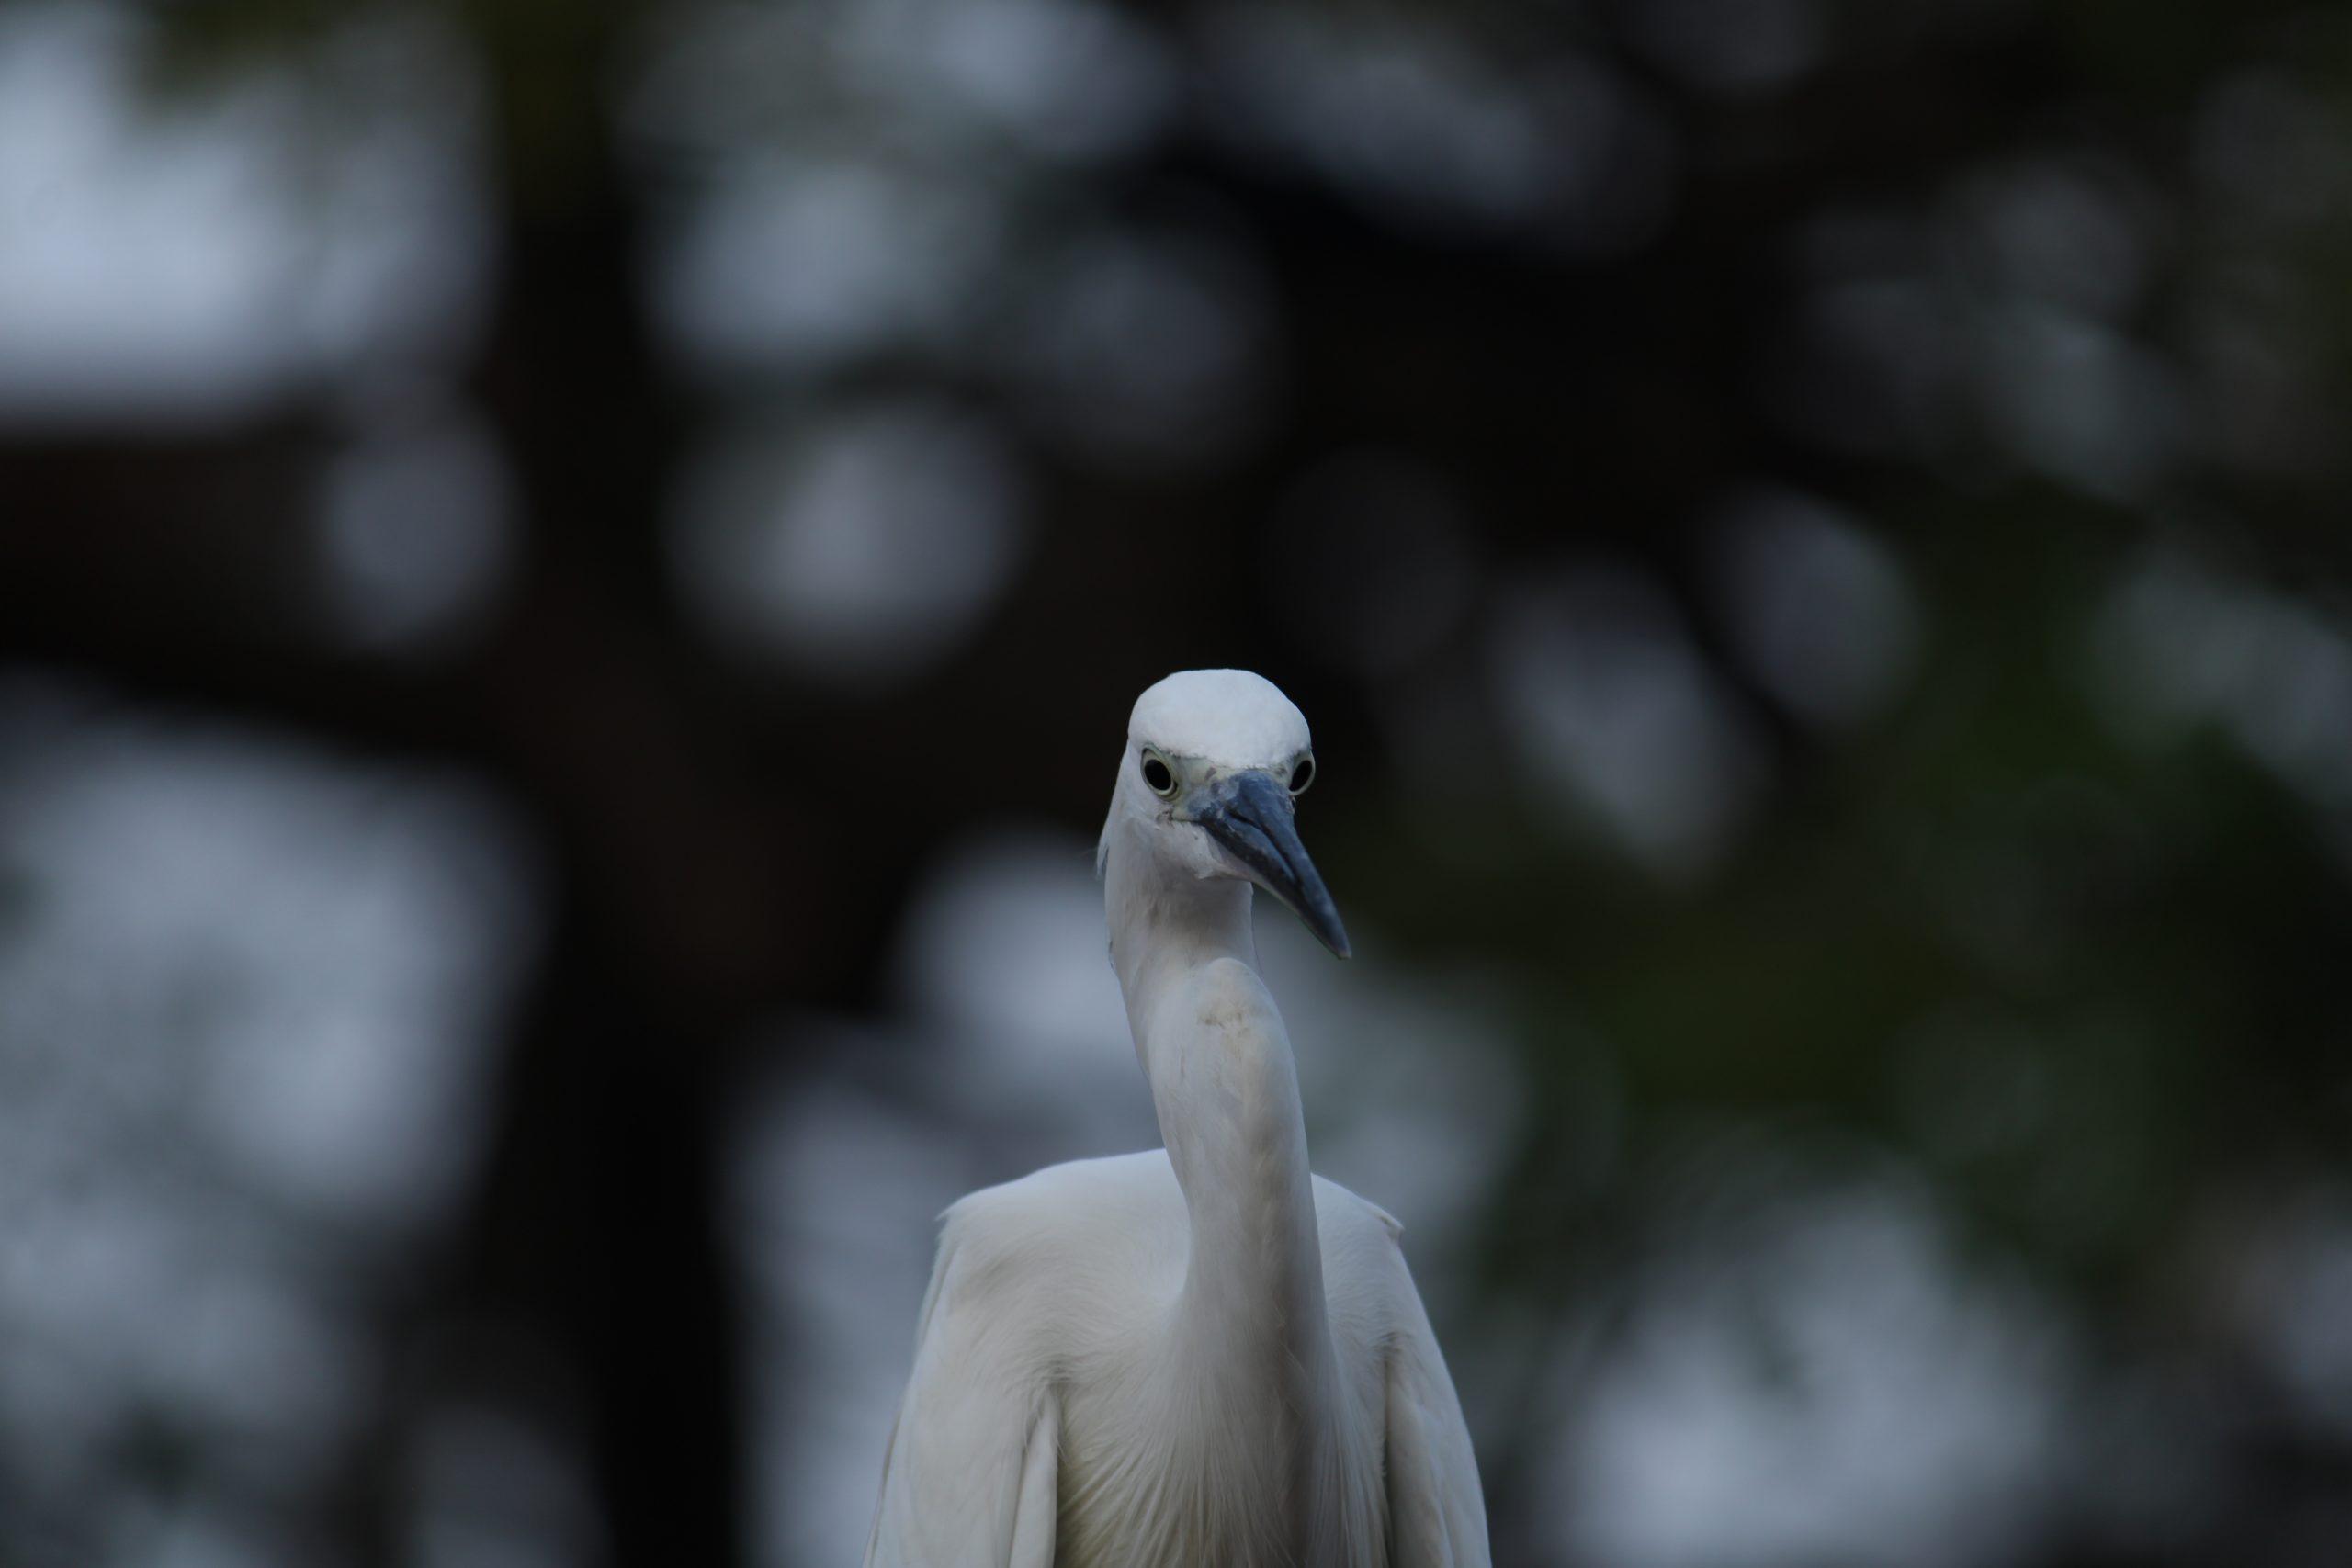 A crane bird